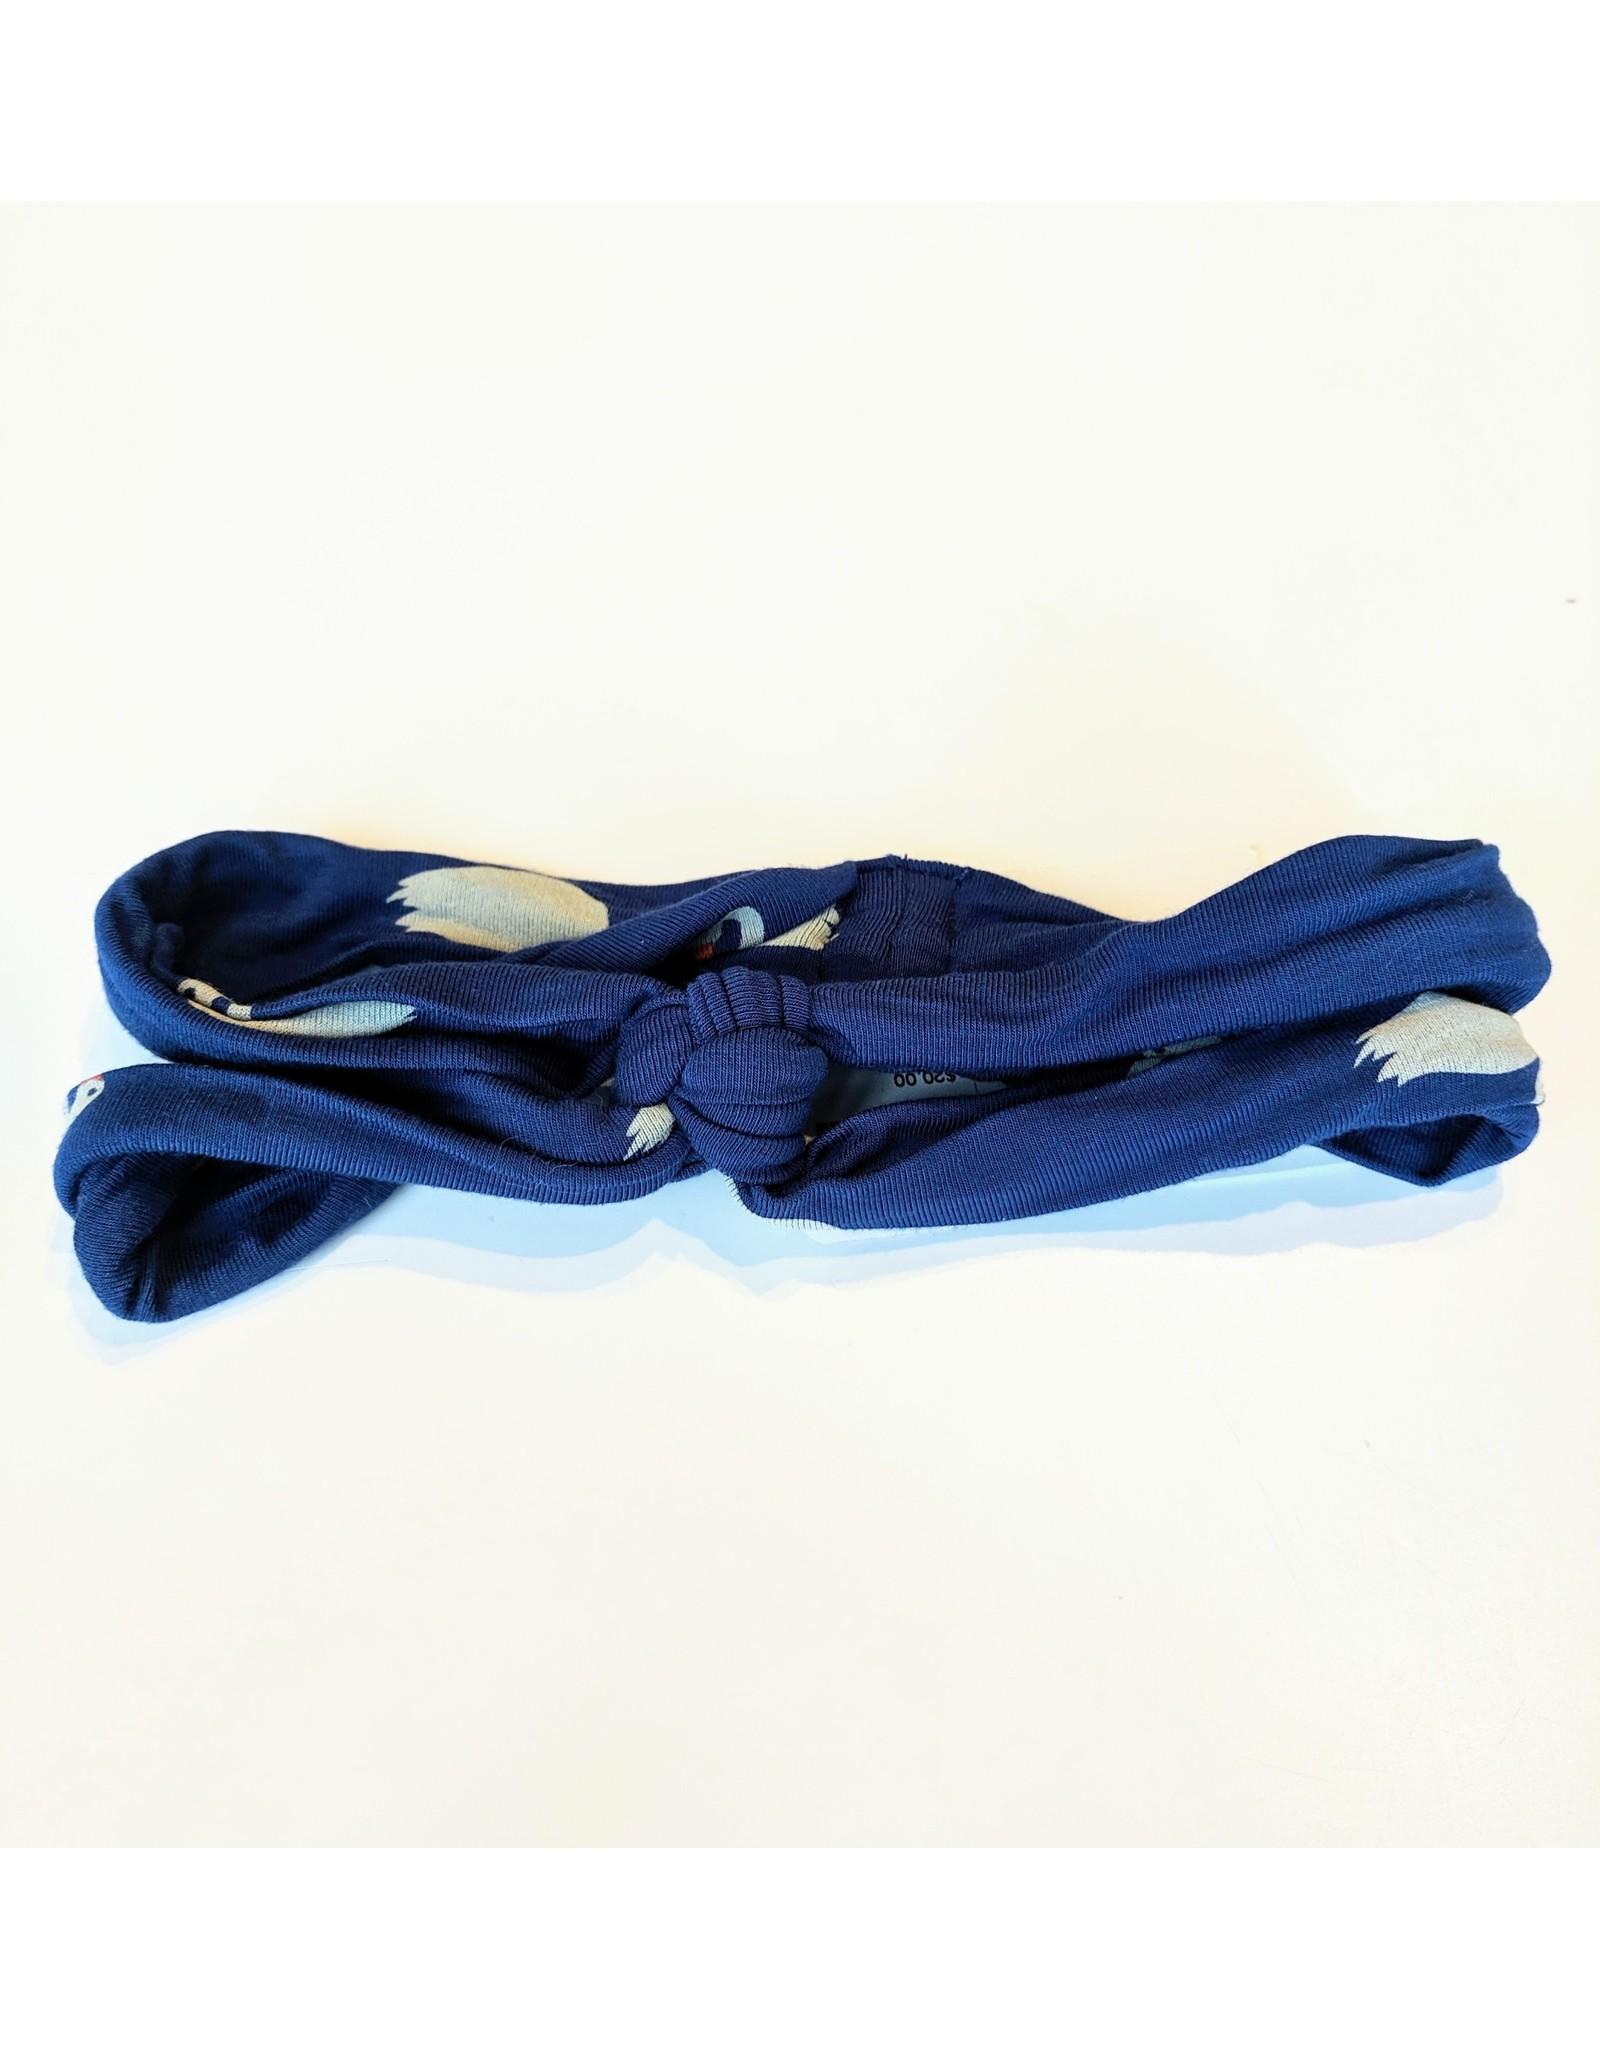 KicKee Pants Kickee Pants Print Knot Headband, Navy Queen's Swans, One Size